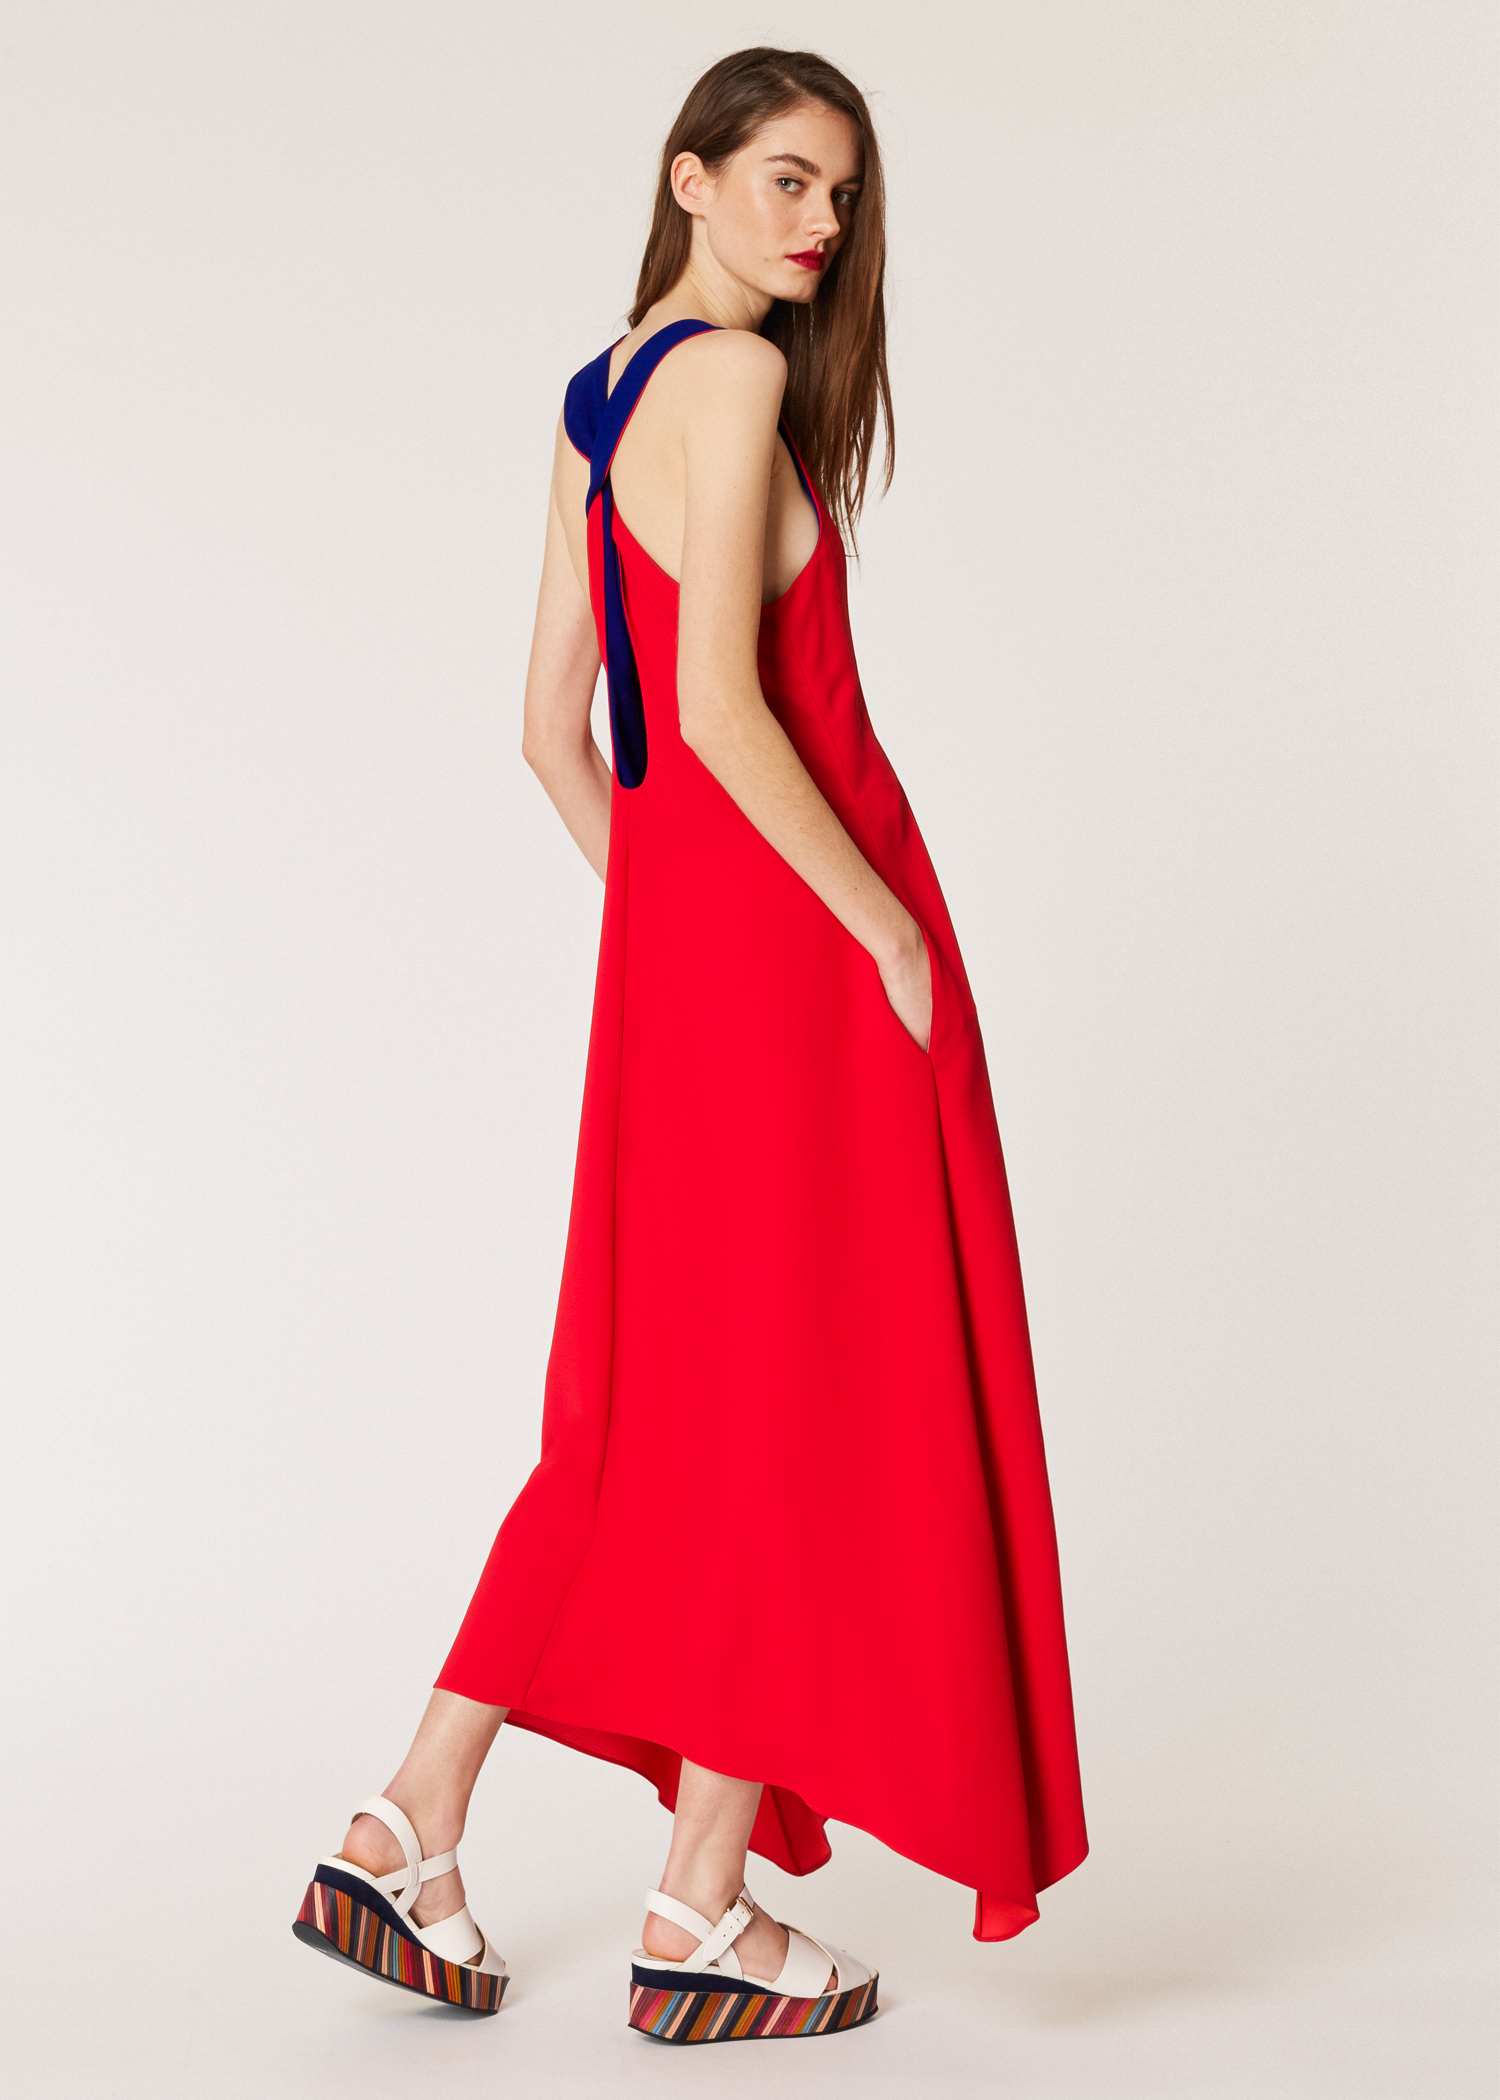 547d0aaf9b8 Model back View - Women's Red Asymmetric Sleeveless Dress Paul Smith